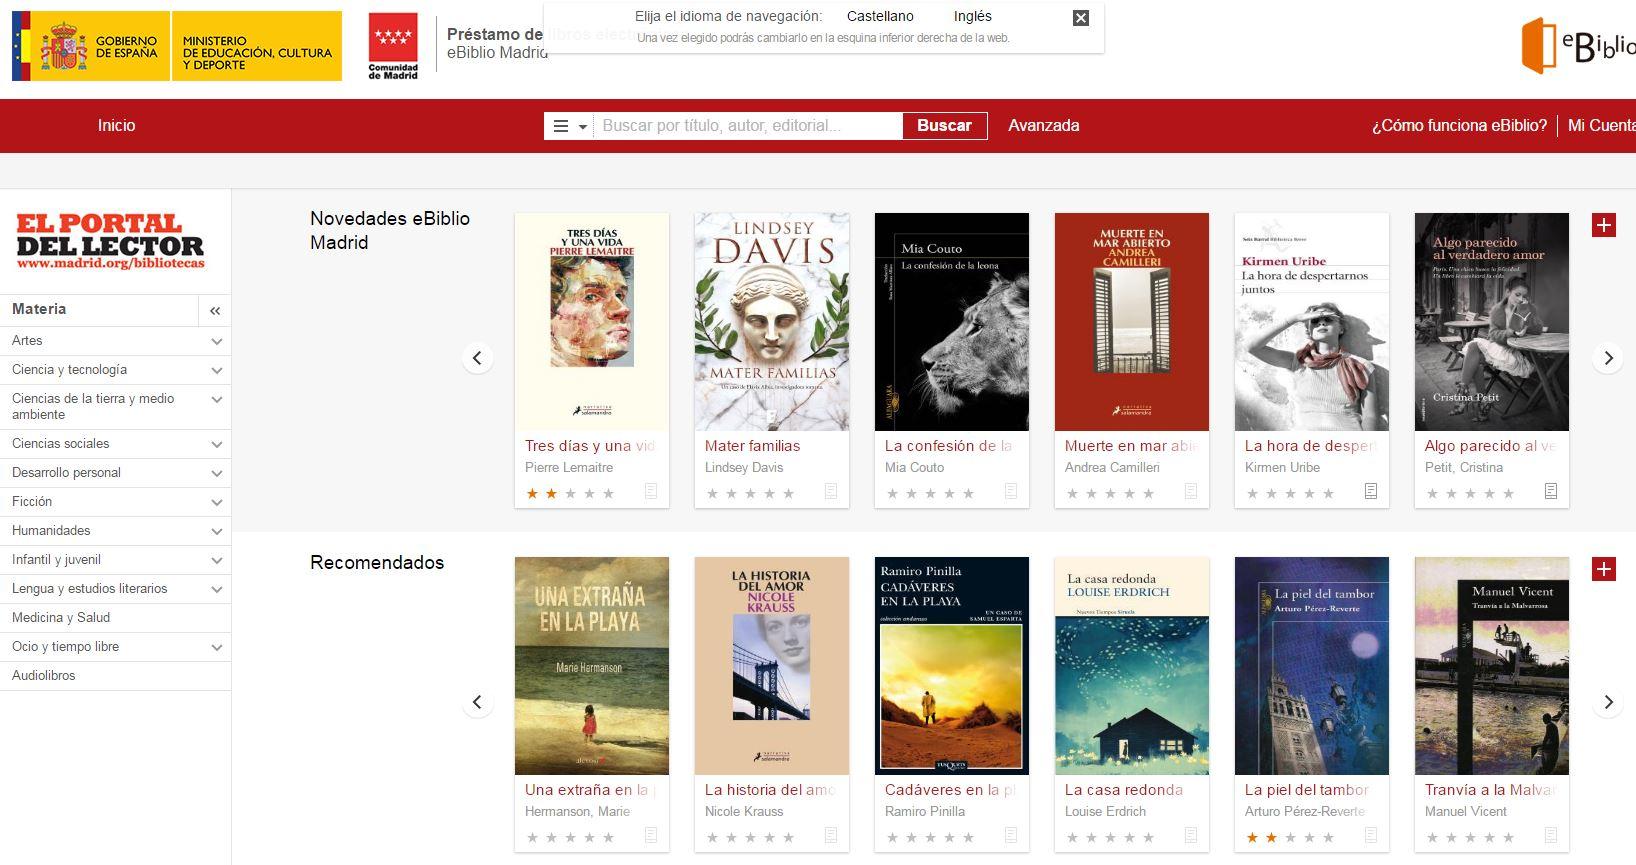 Descargar gratis libros - eBiblio